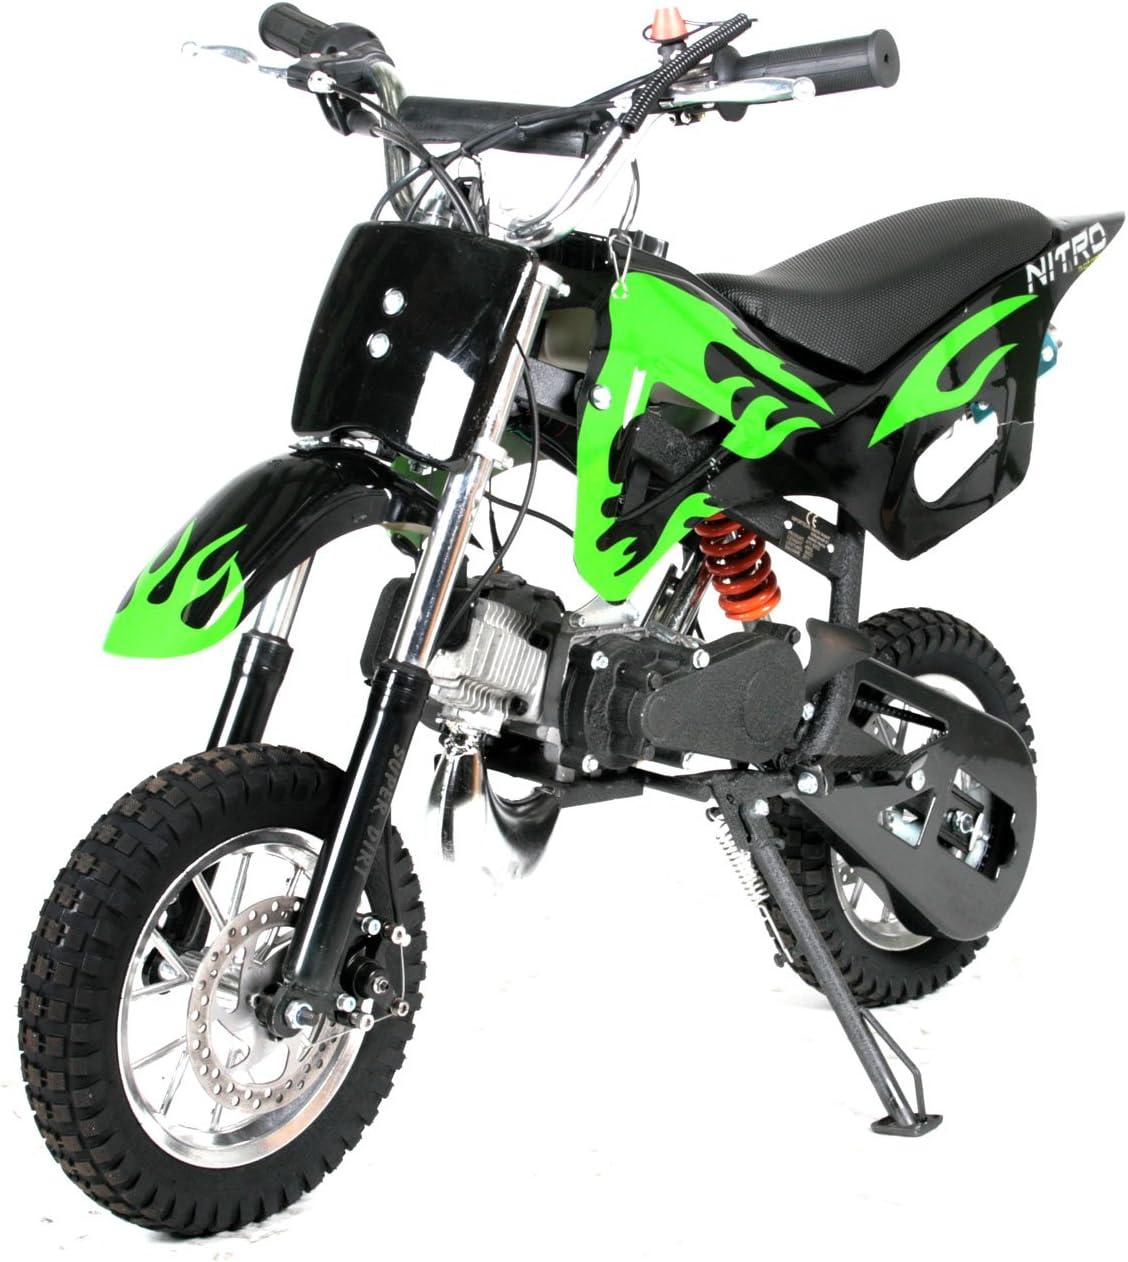 Schwungscheibe Pocket-Bike Alu Seilzugstarter DirtBike Cross Mini ATV Seilzug